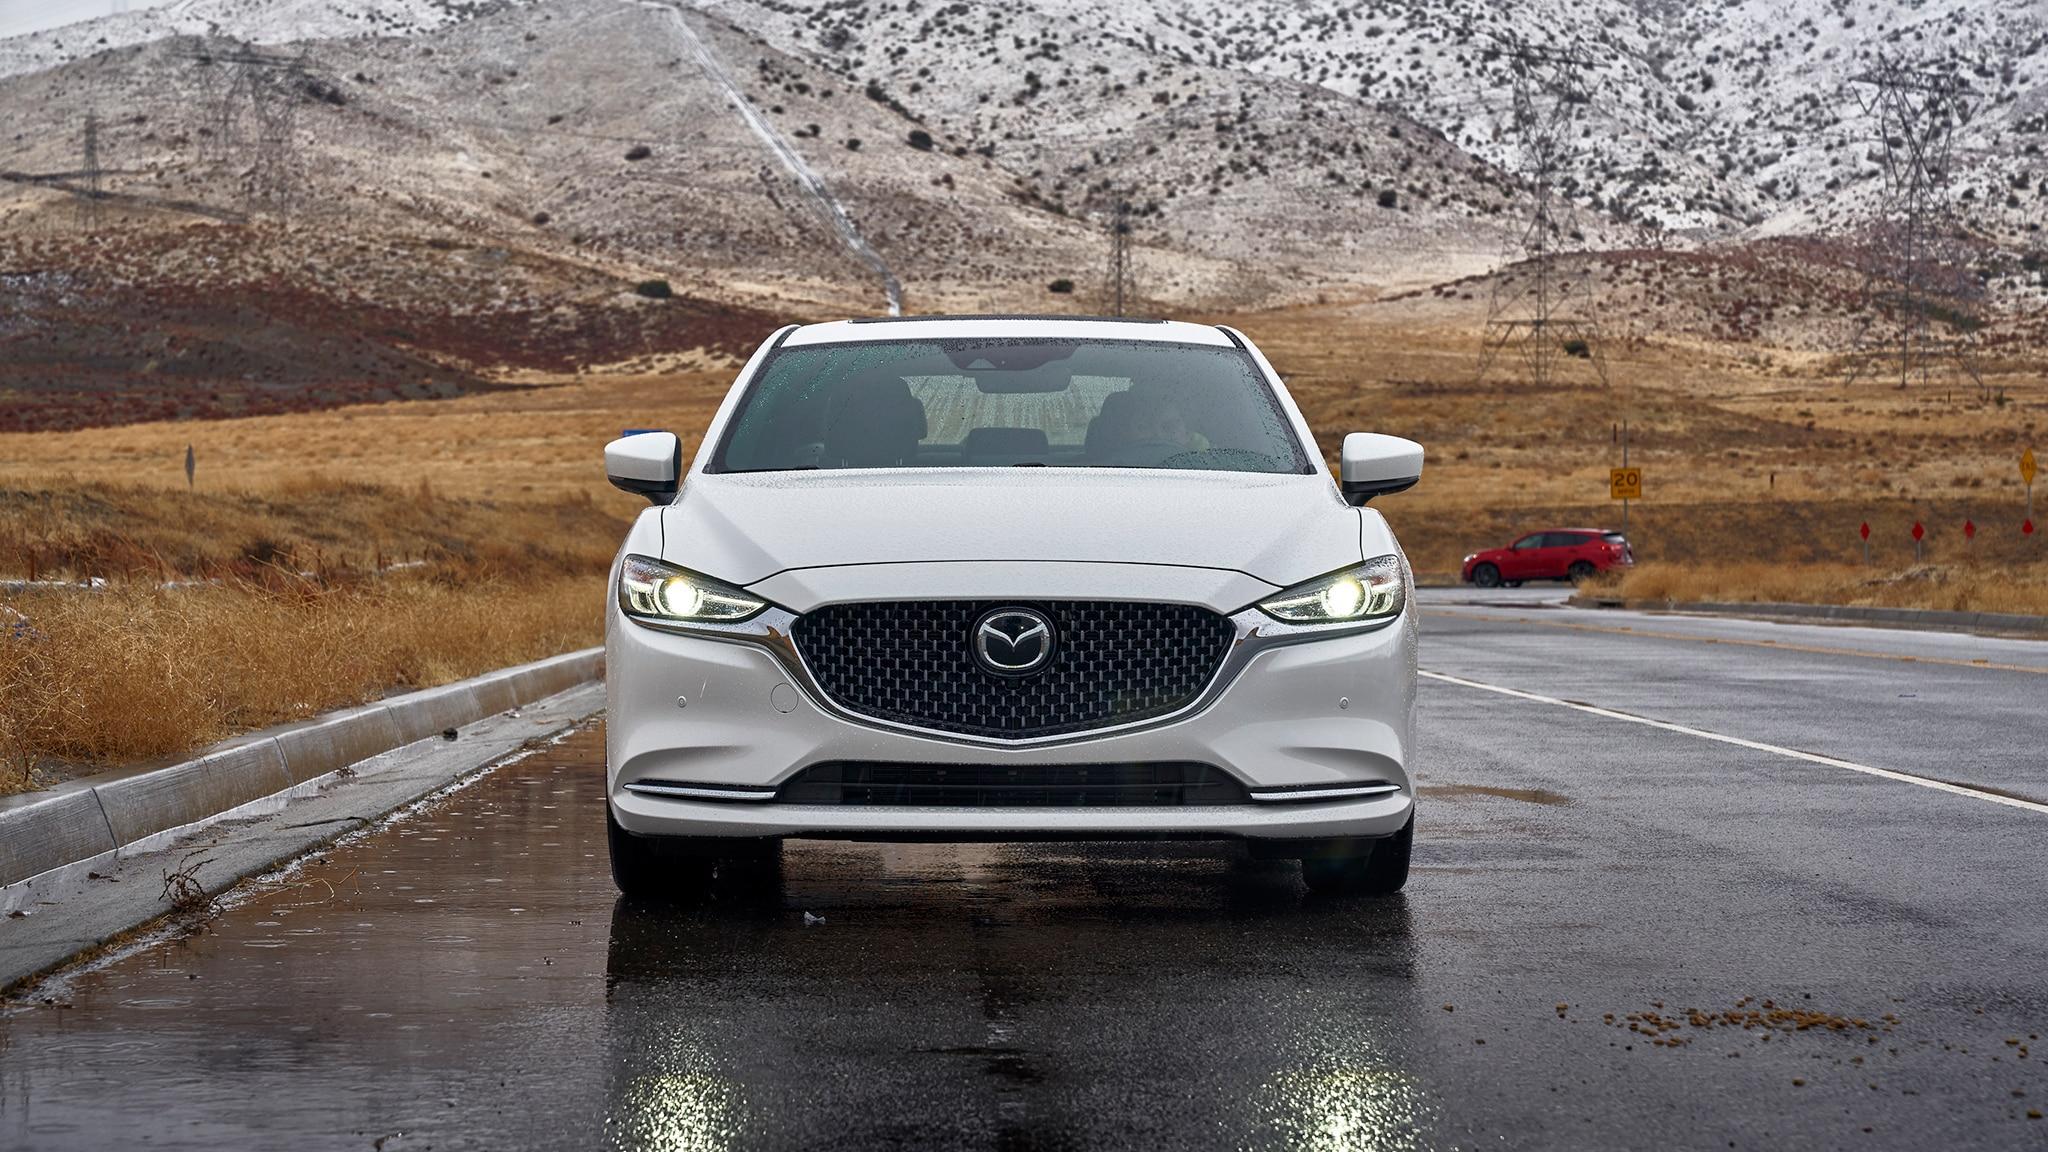 2019 Mazda 6 Turbo Signature: Power and Premiumness